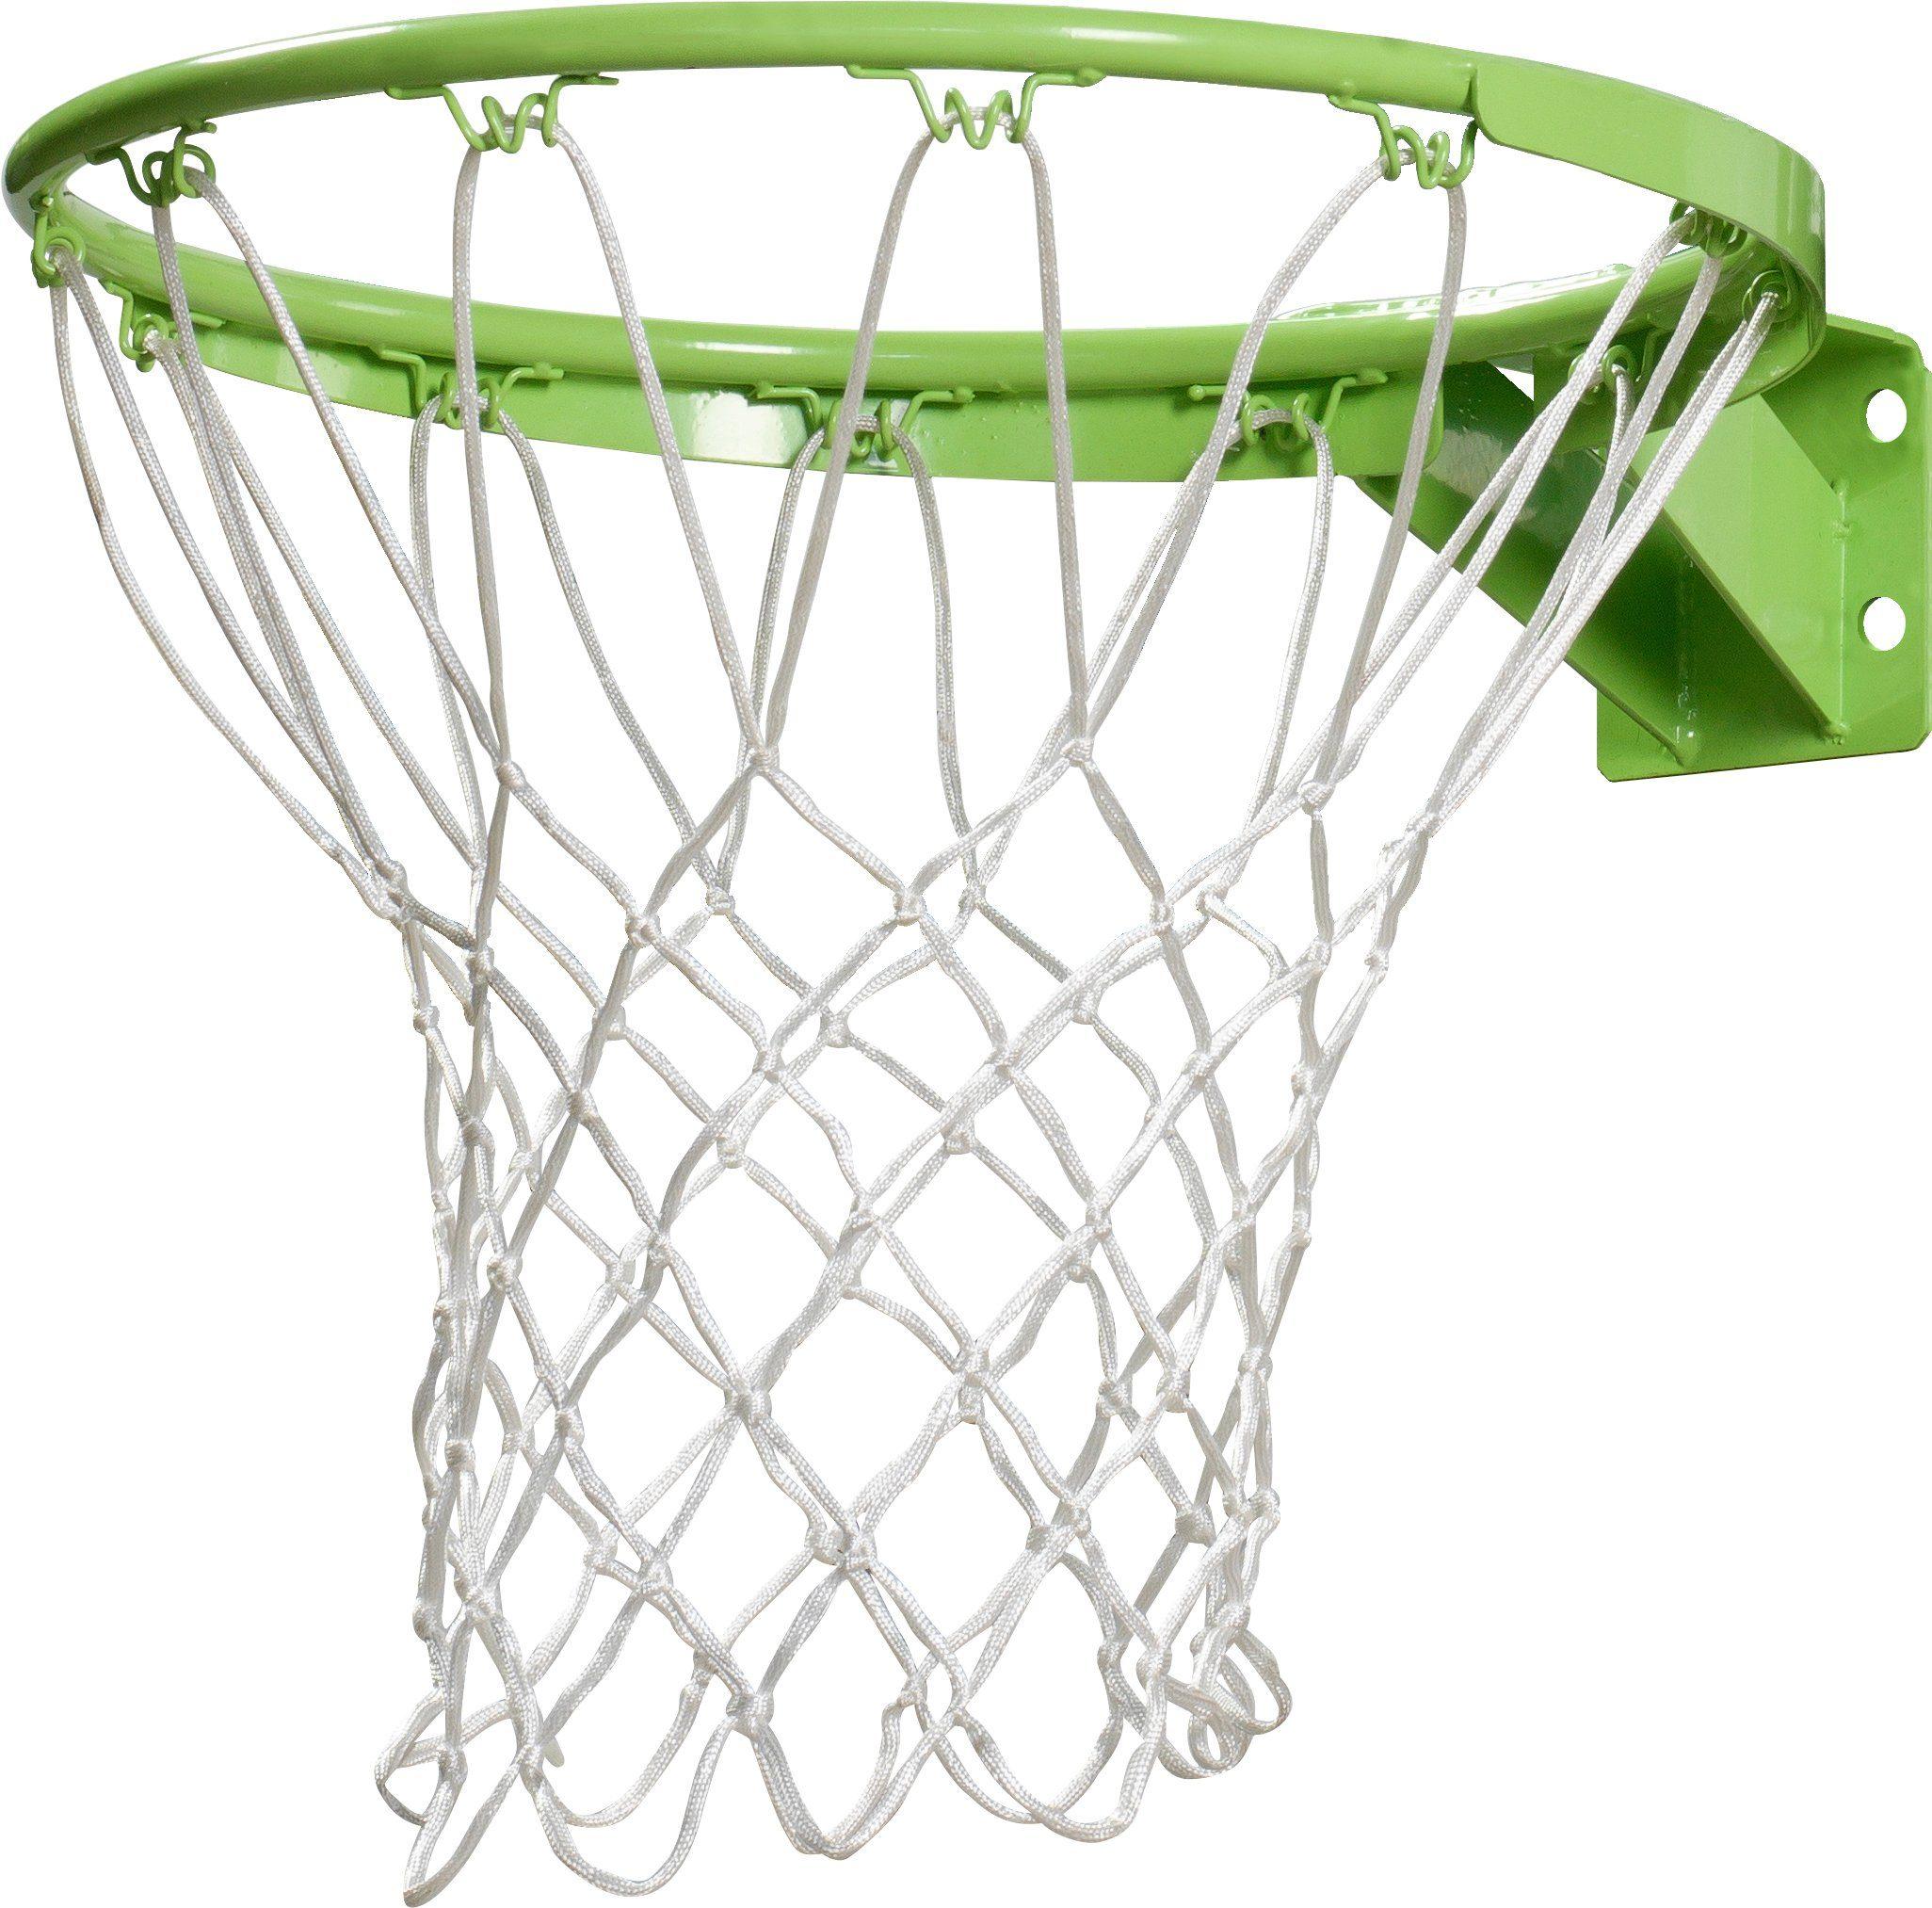 EXIT Basketballkorb »Galaxy«, BxH: 65x53 cm, Ring + Netz